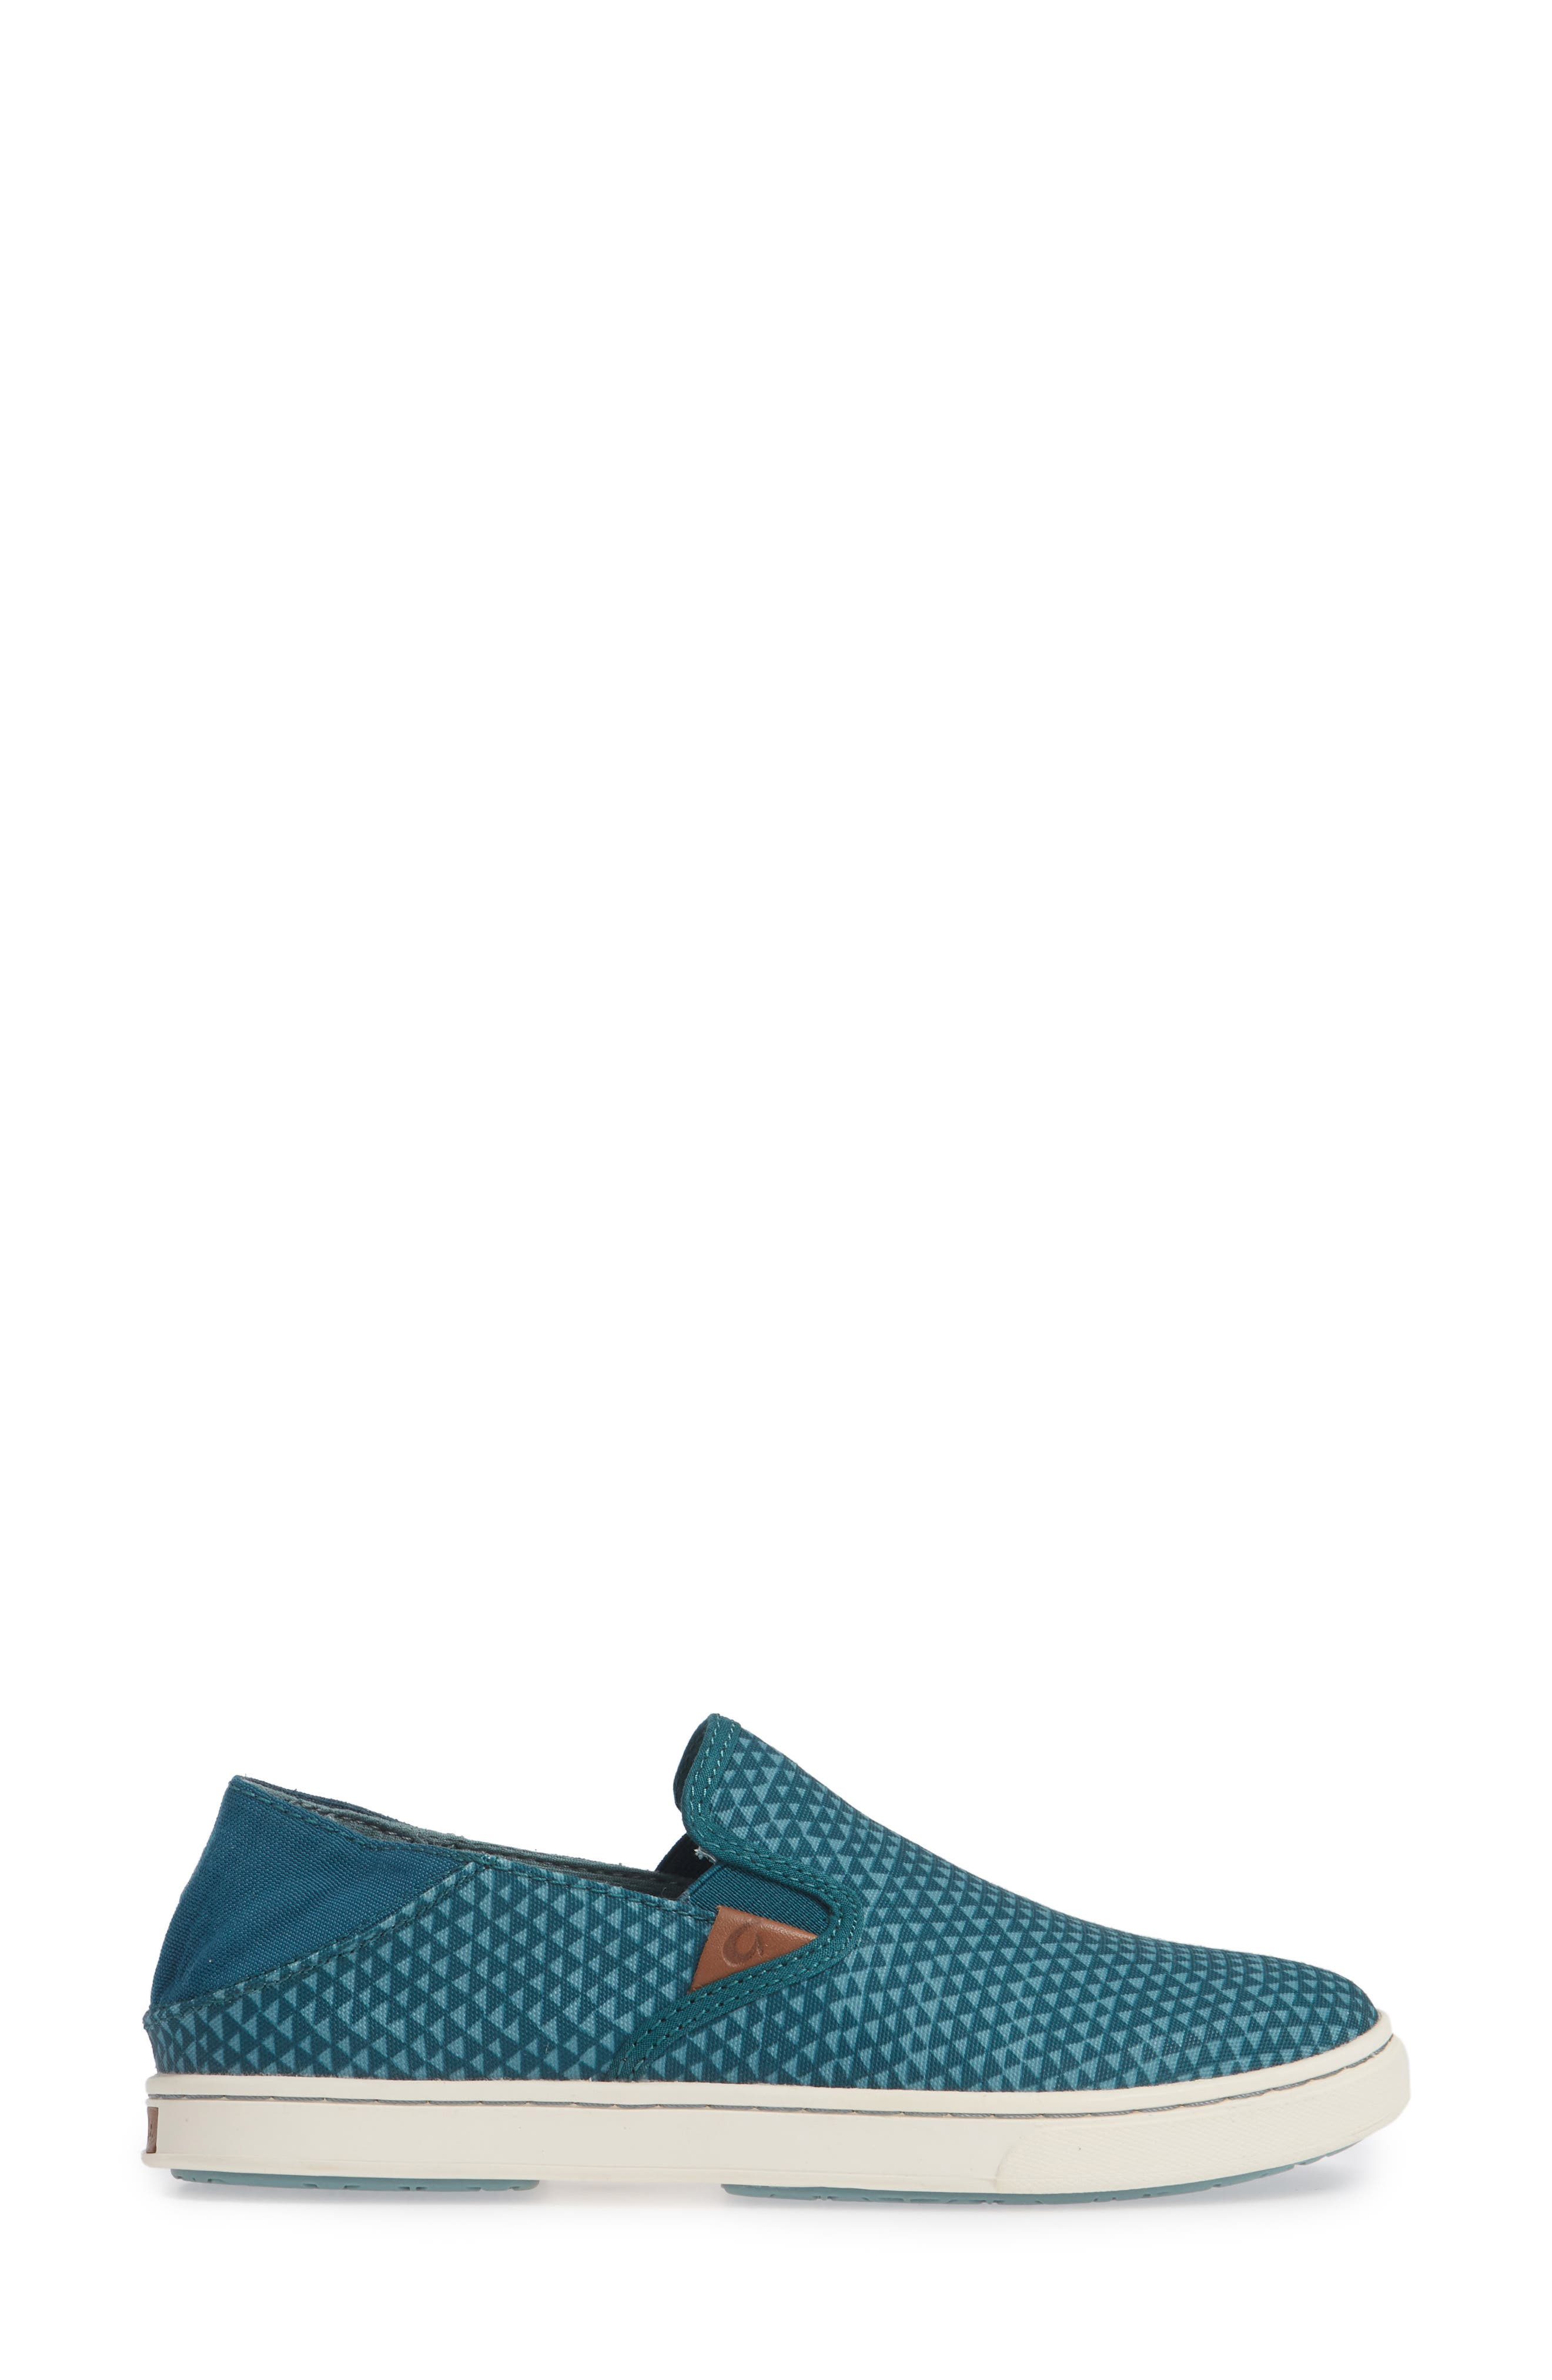 Pehuea Pa'i Convertible Sneaker,                             Alternate thumbnail 2, color,                             DEEP TEAL/ TRIANGLE FABRIC